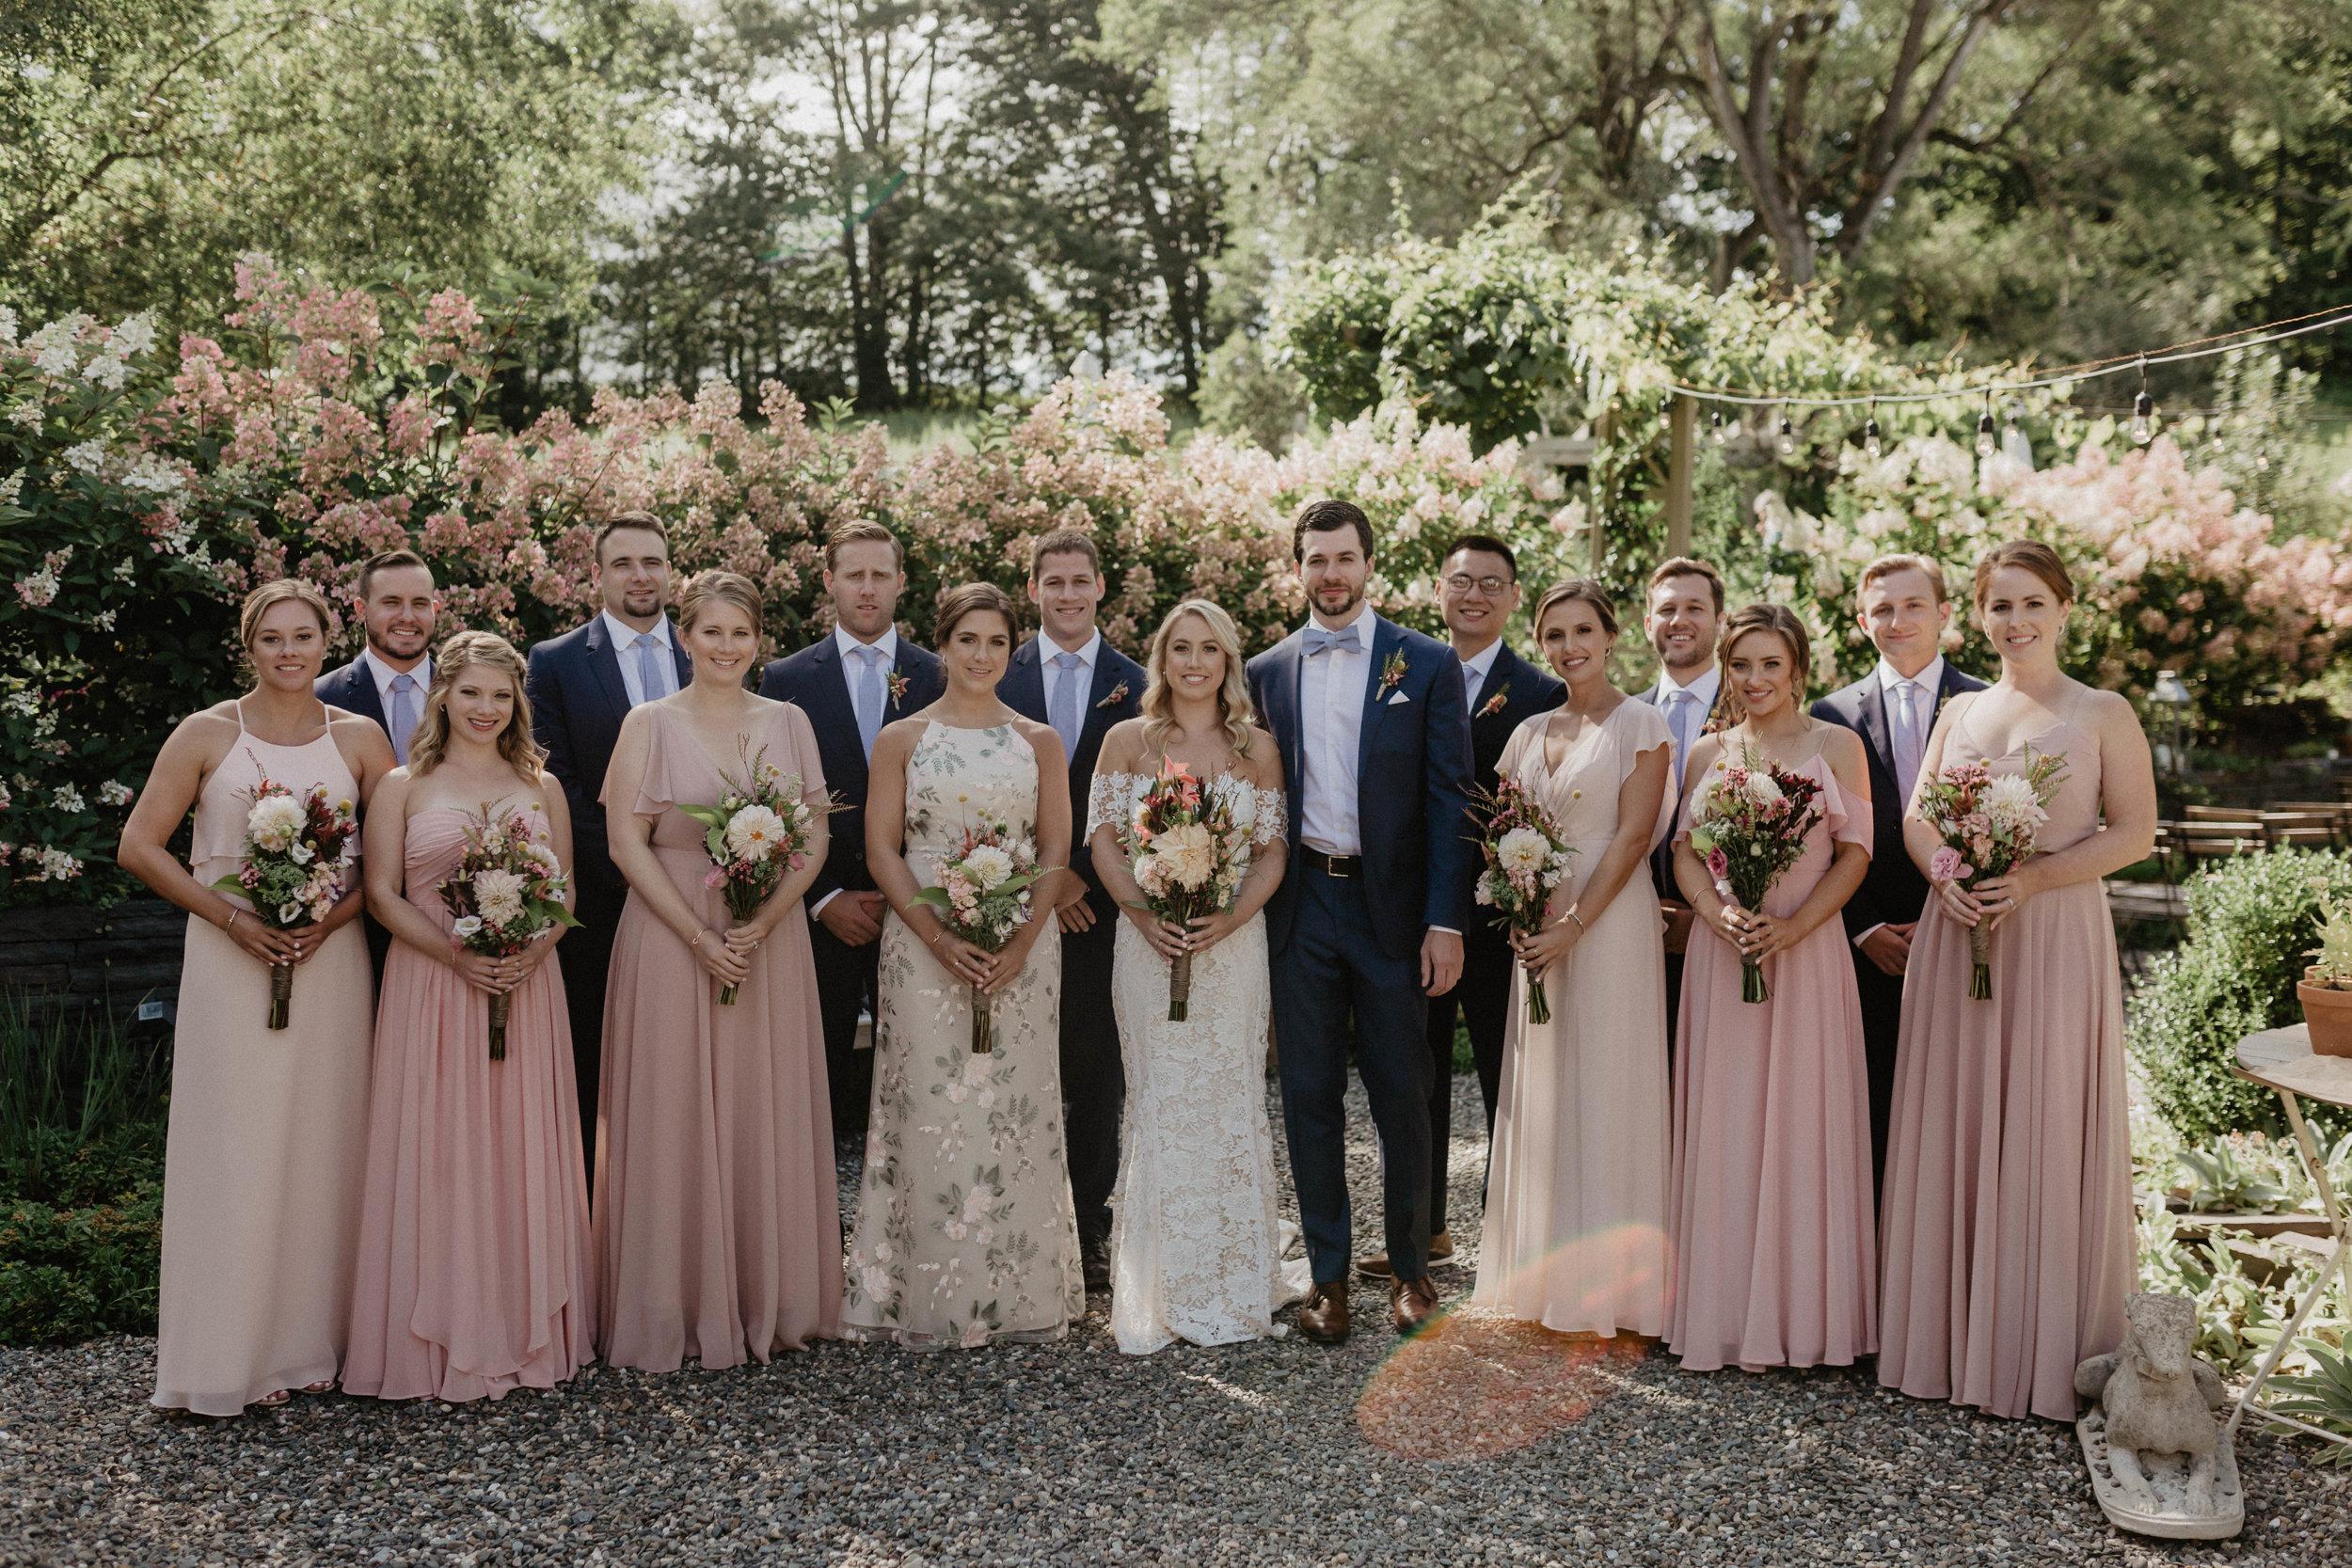 m-and-d-farm-wedding-52.jpg